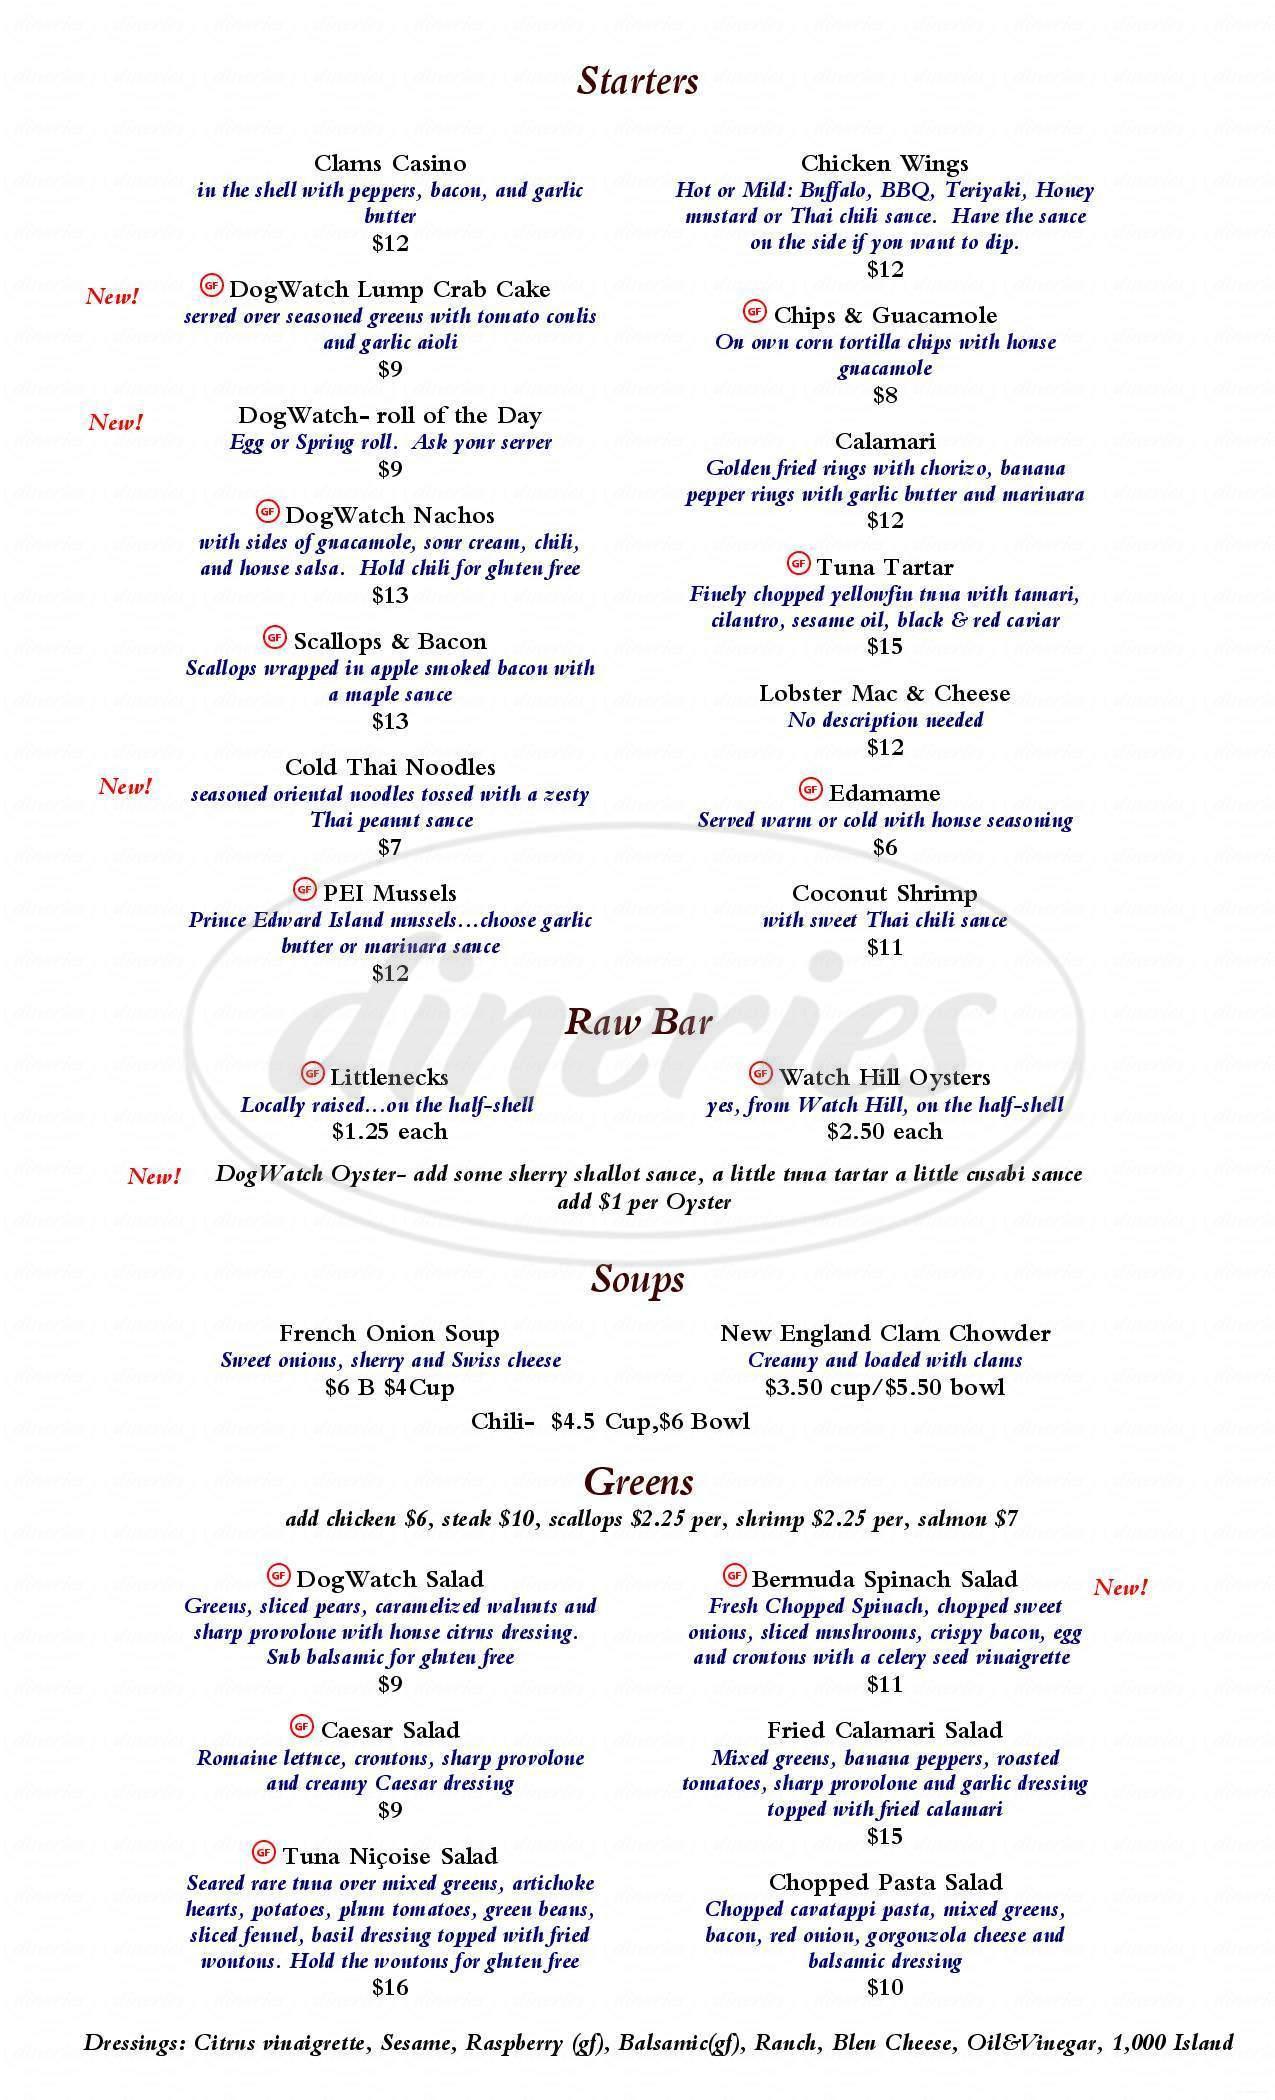 menu for The Dogwatch Cafe